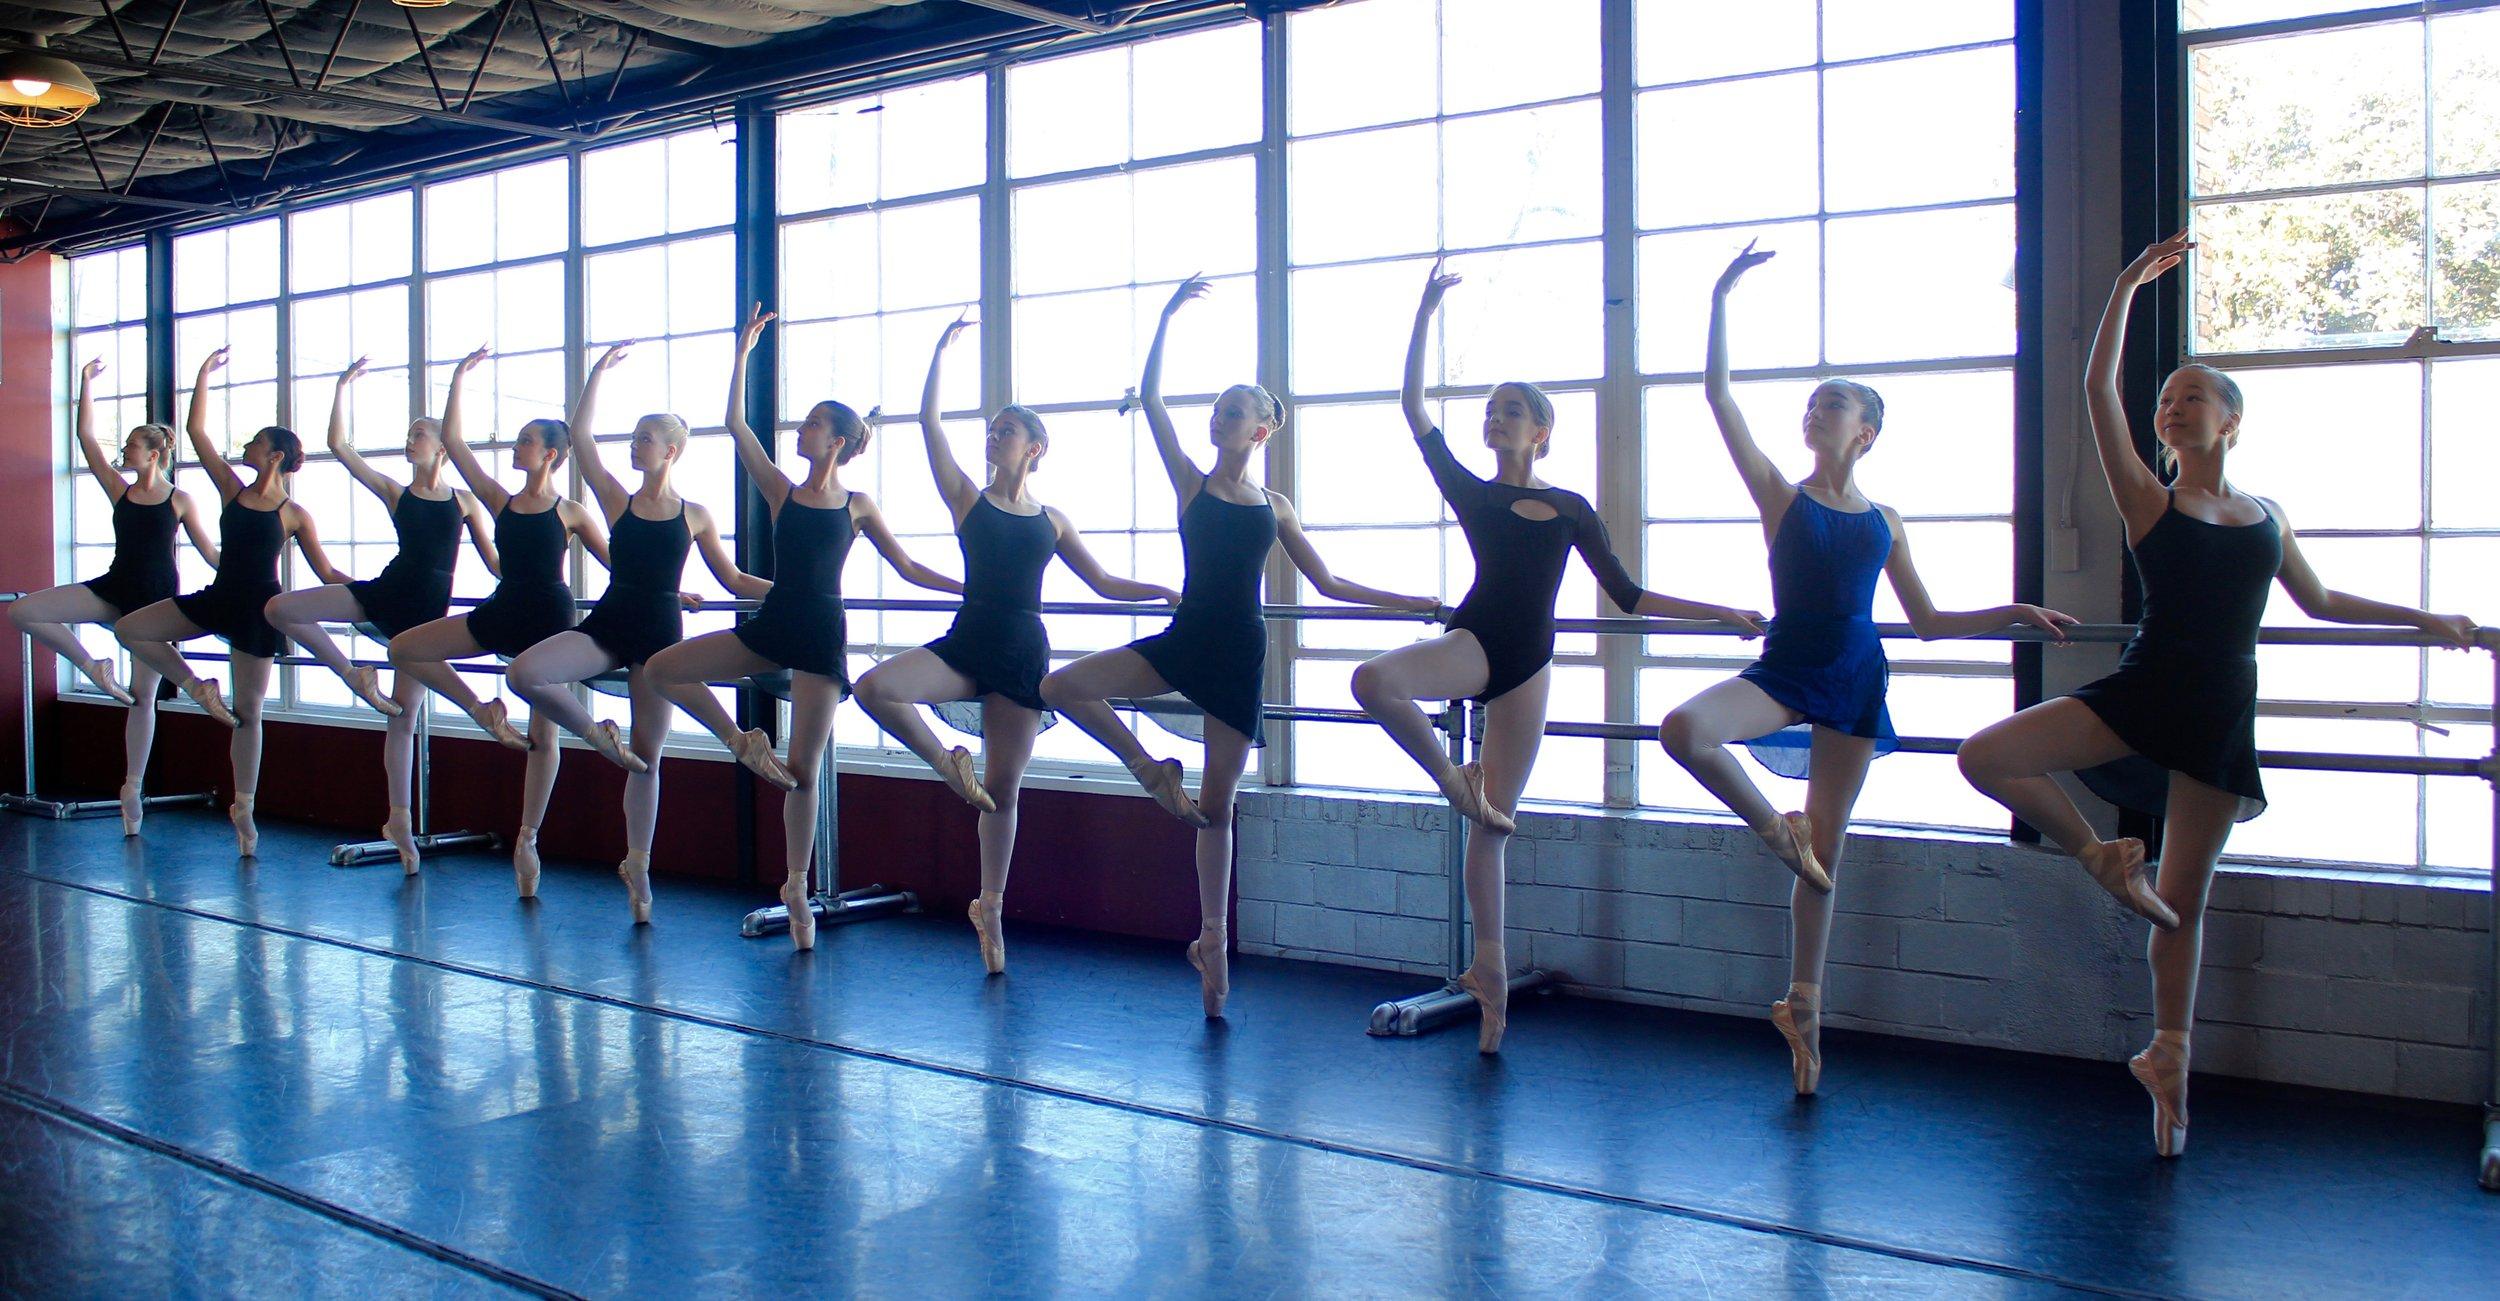 DanceSchool.jpg